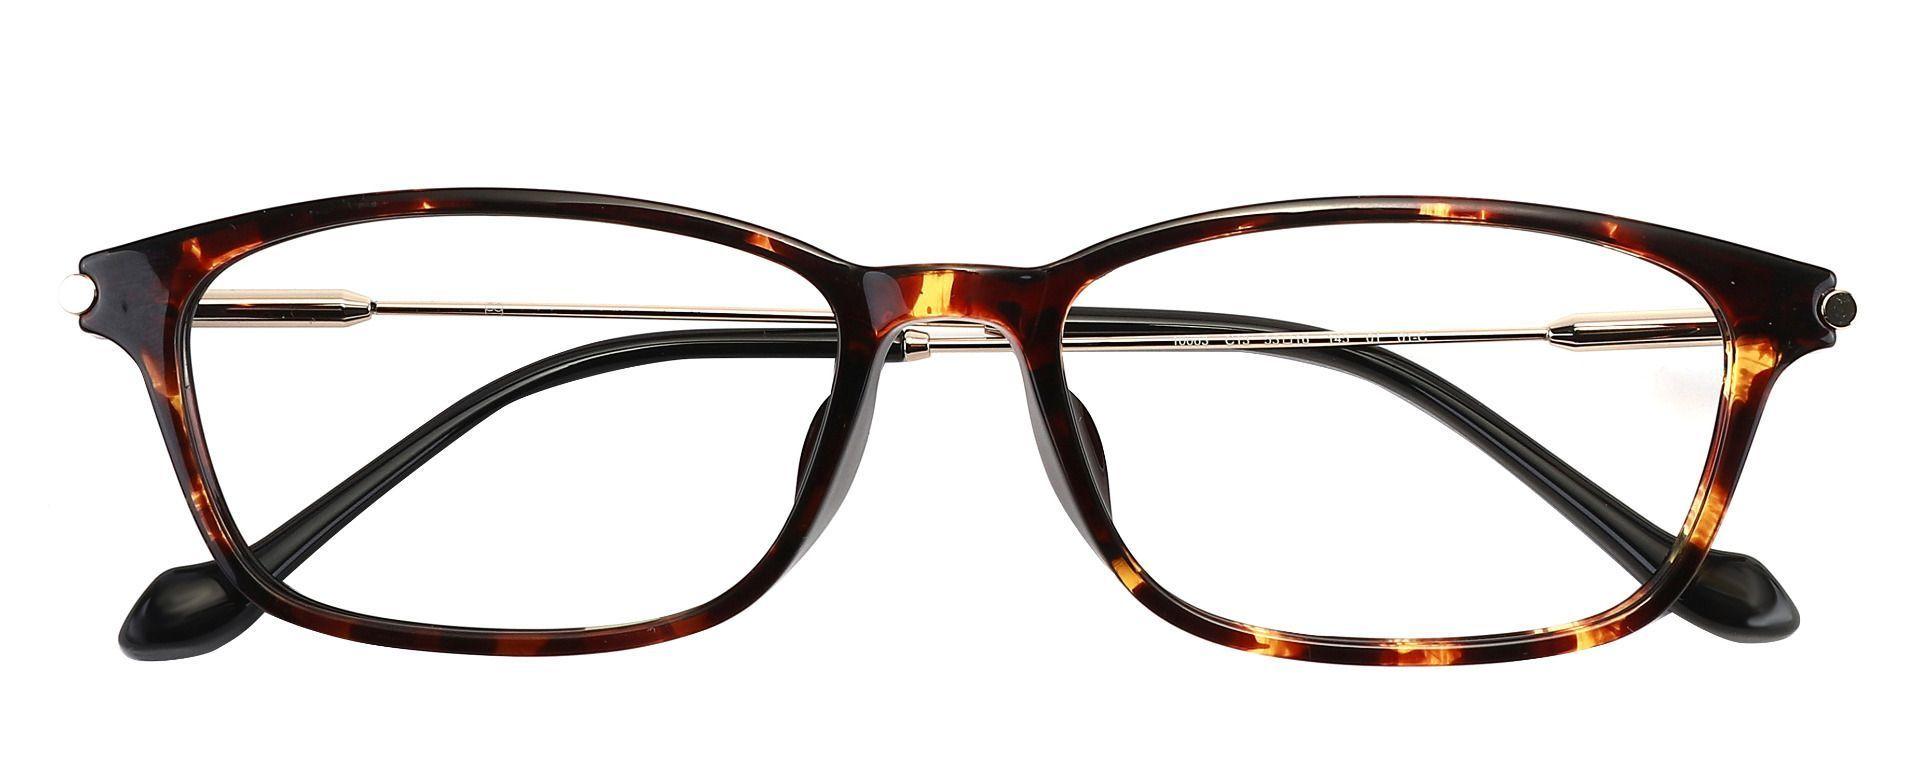 LaBelle Rectangle Prescription Glasses - Tortoise